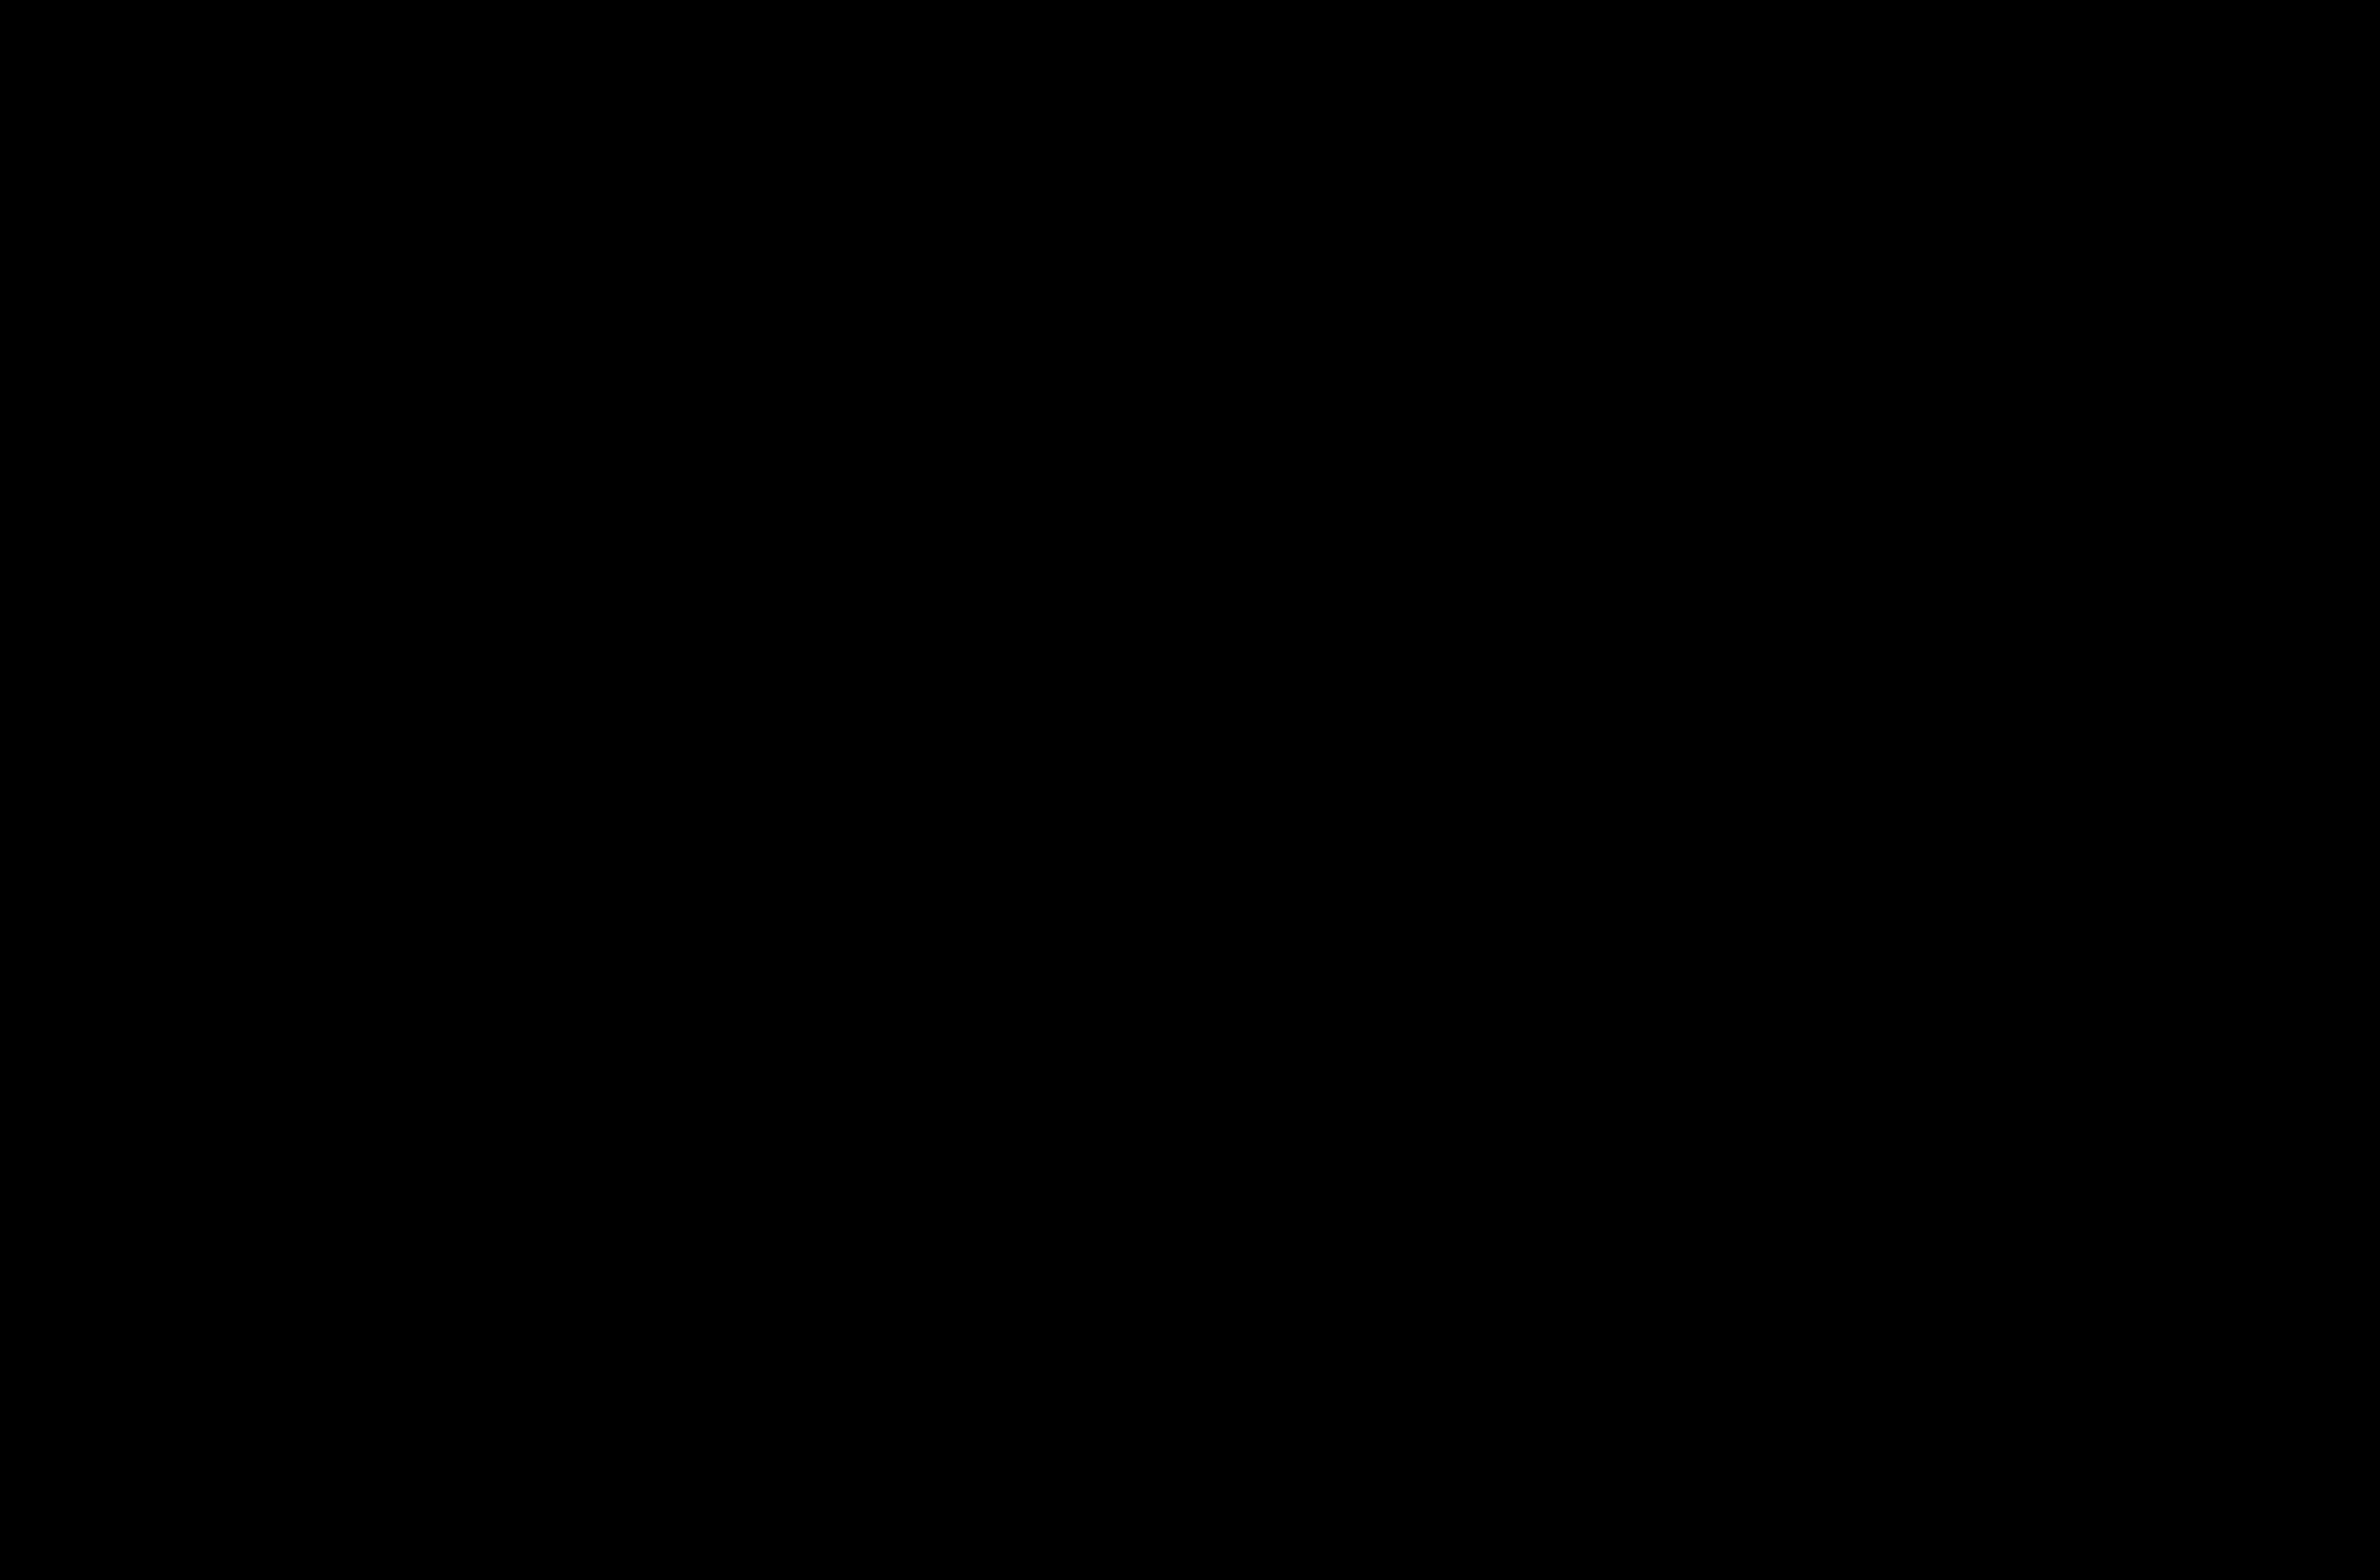 _2BP0059_A